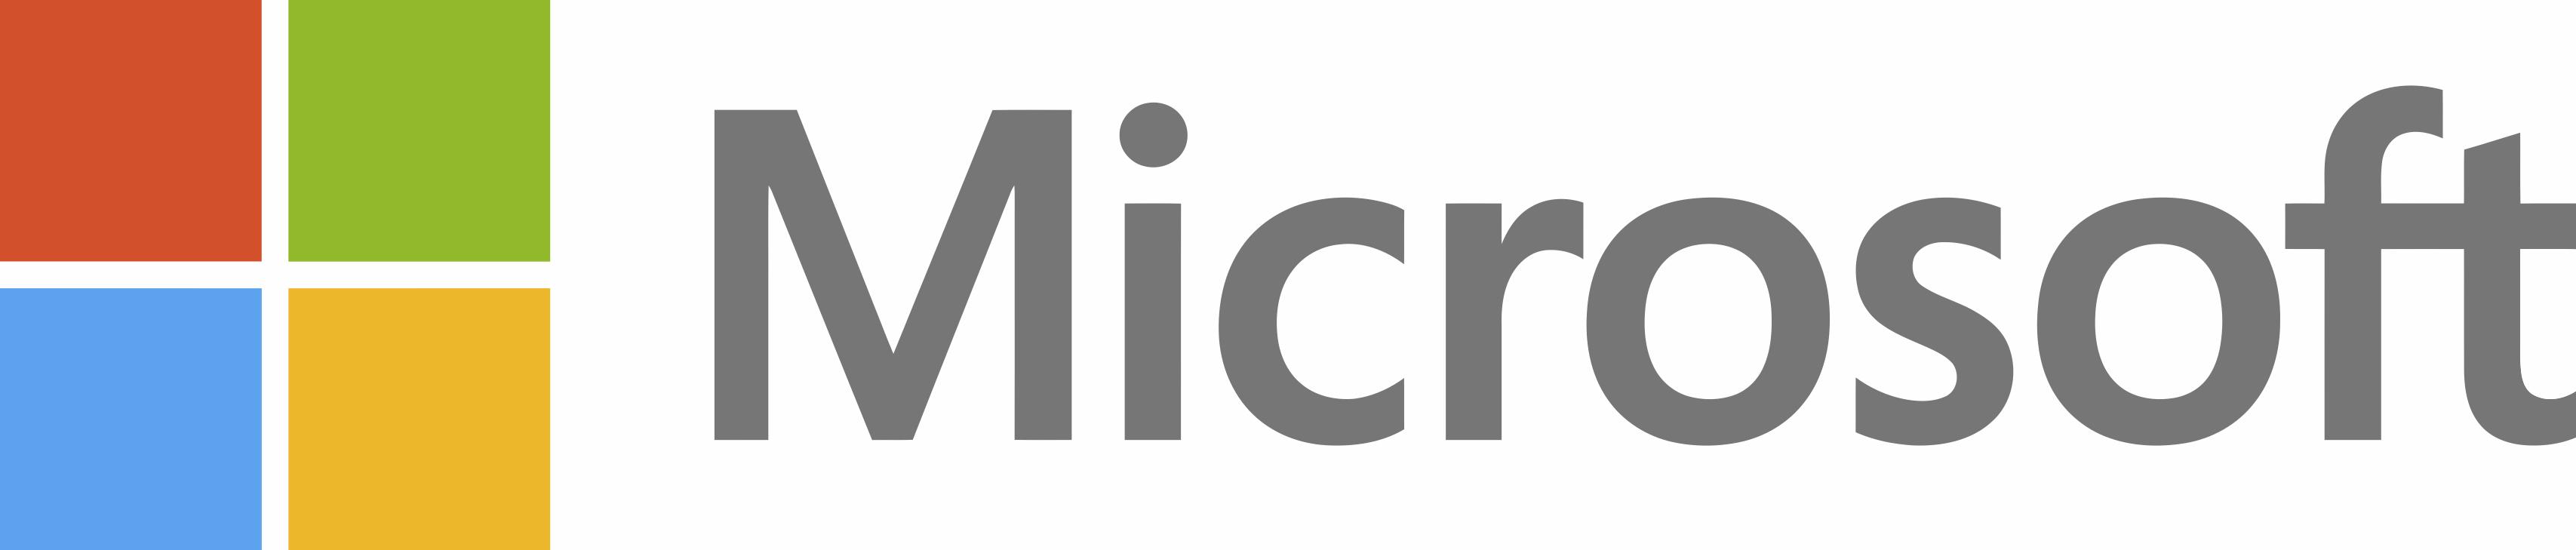 software company brand logo